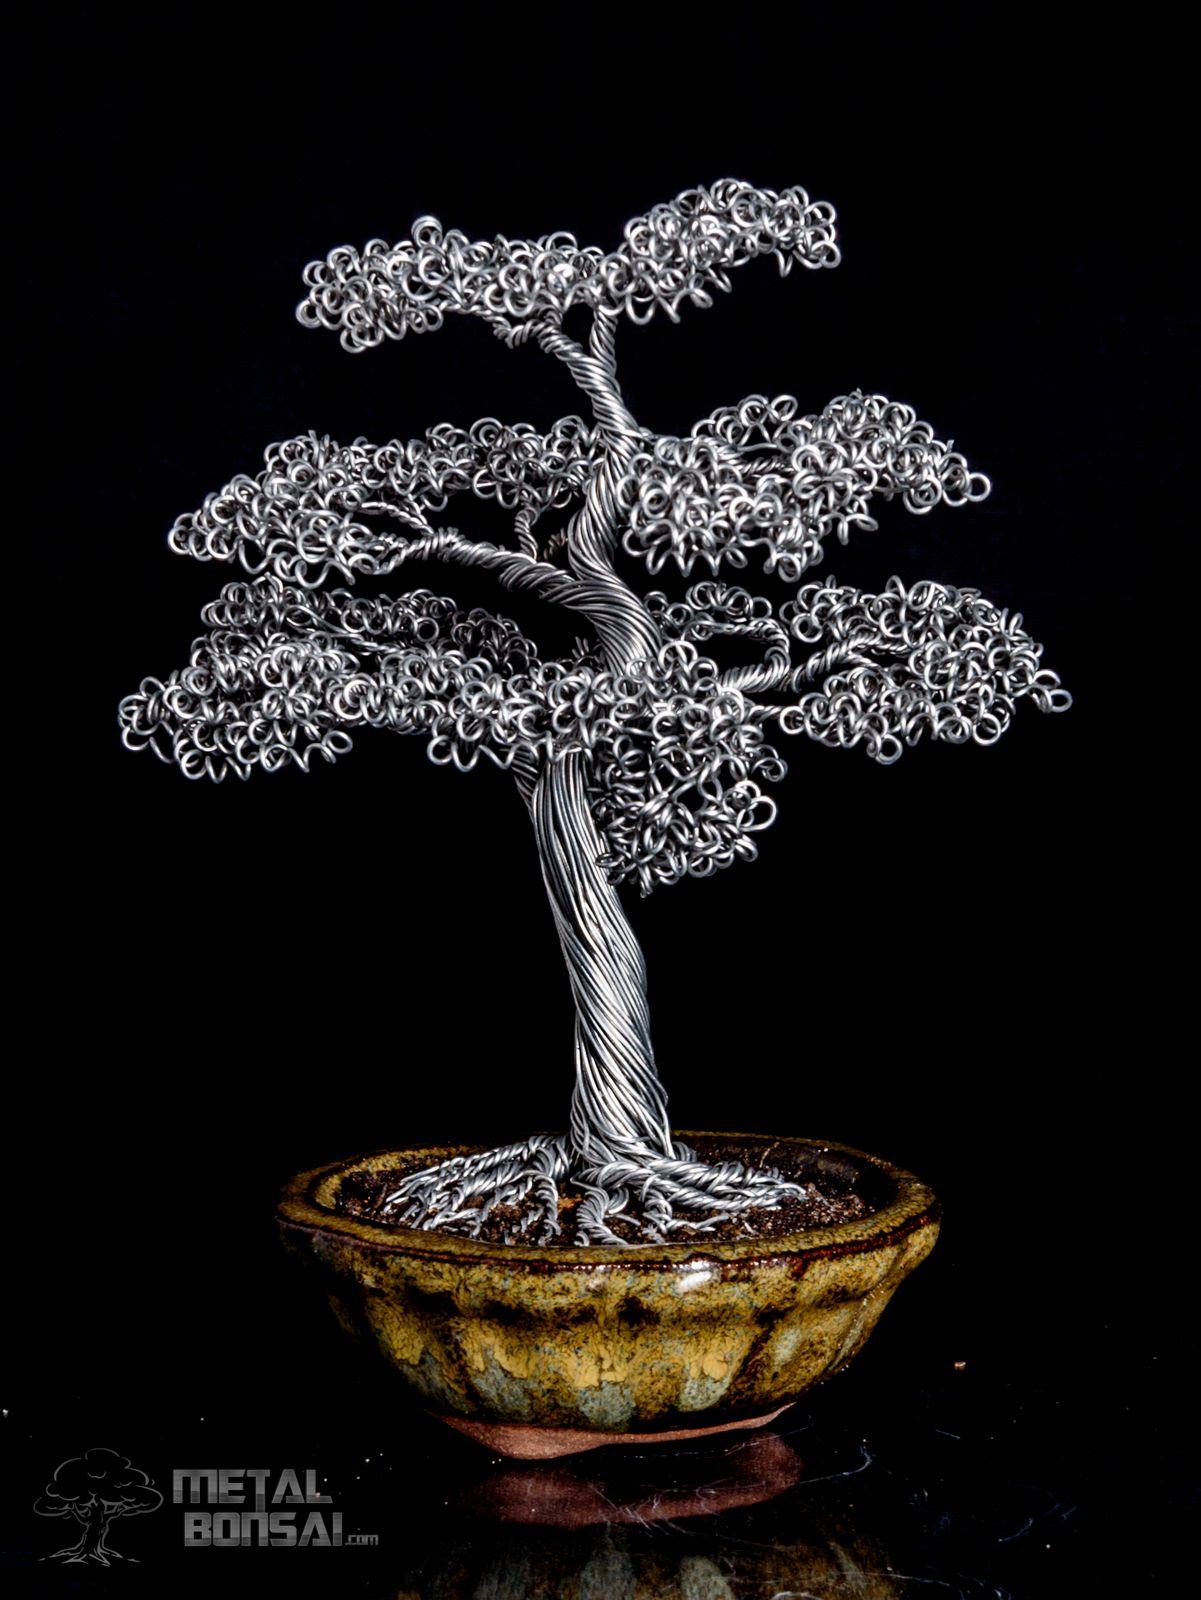 Metal Bonsai Tree : metal, bonsai, Informal, Upright, Moyogi, Bonsai, Sculpture, Sculpture,